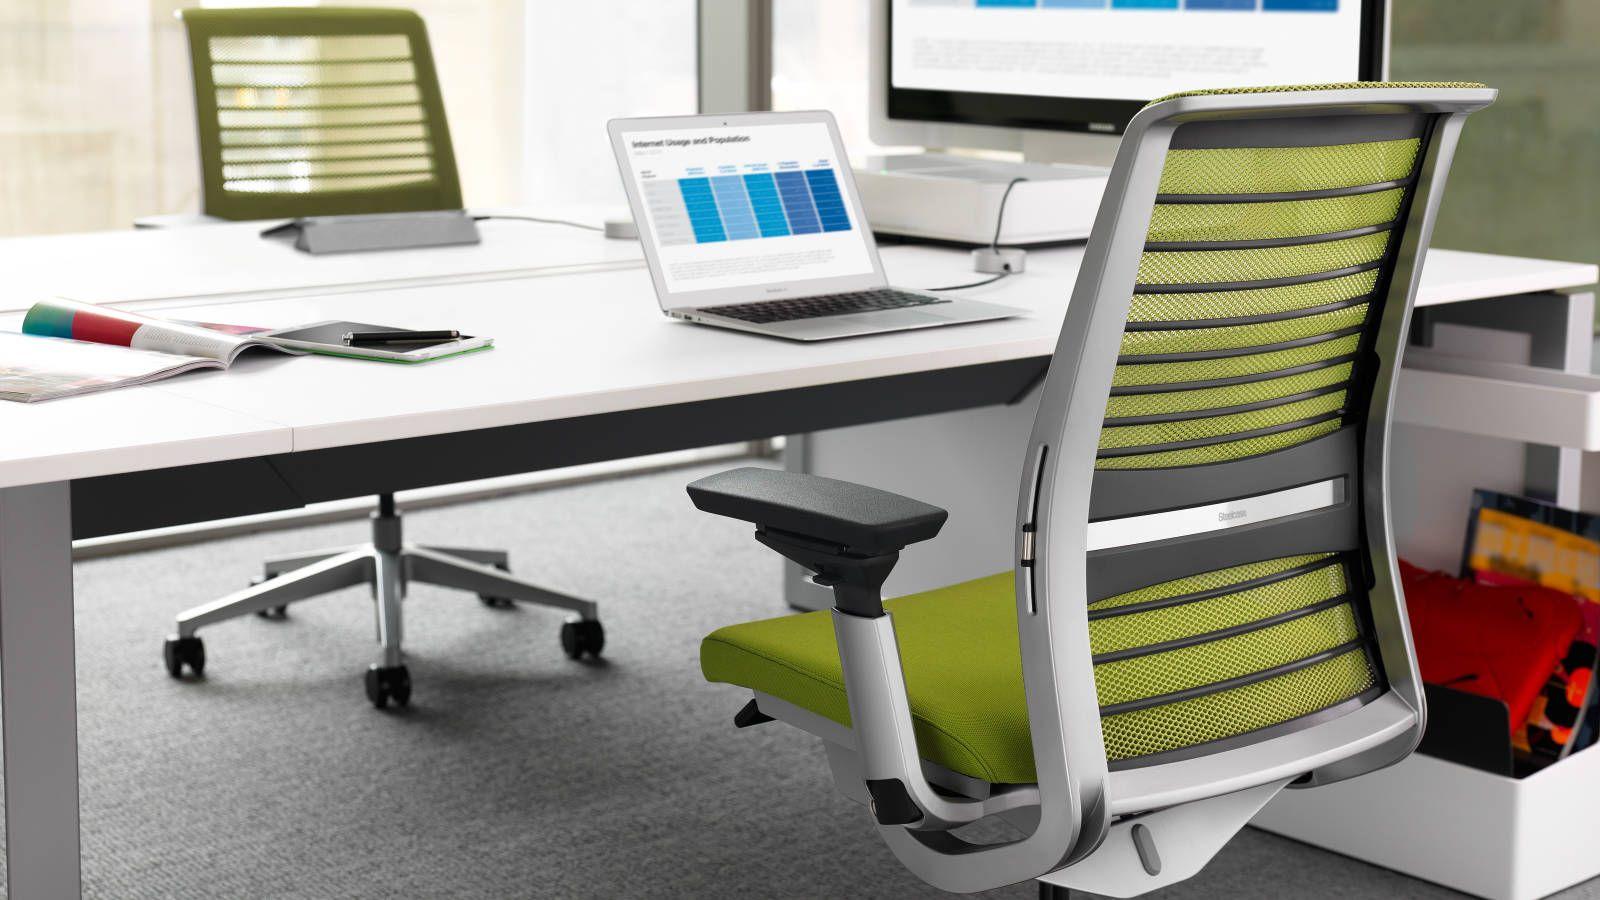 Think Adjustable office chair, Ergonomic chair